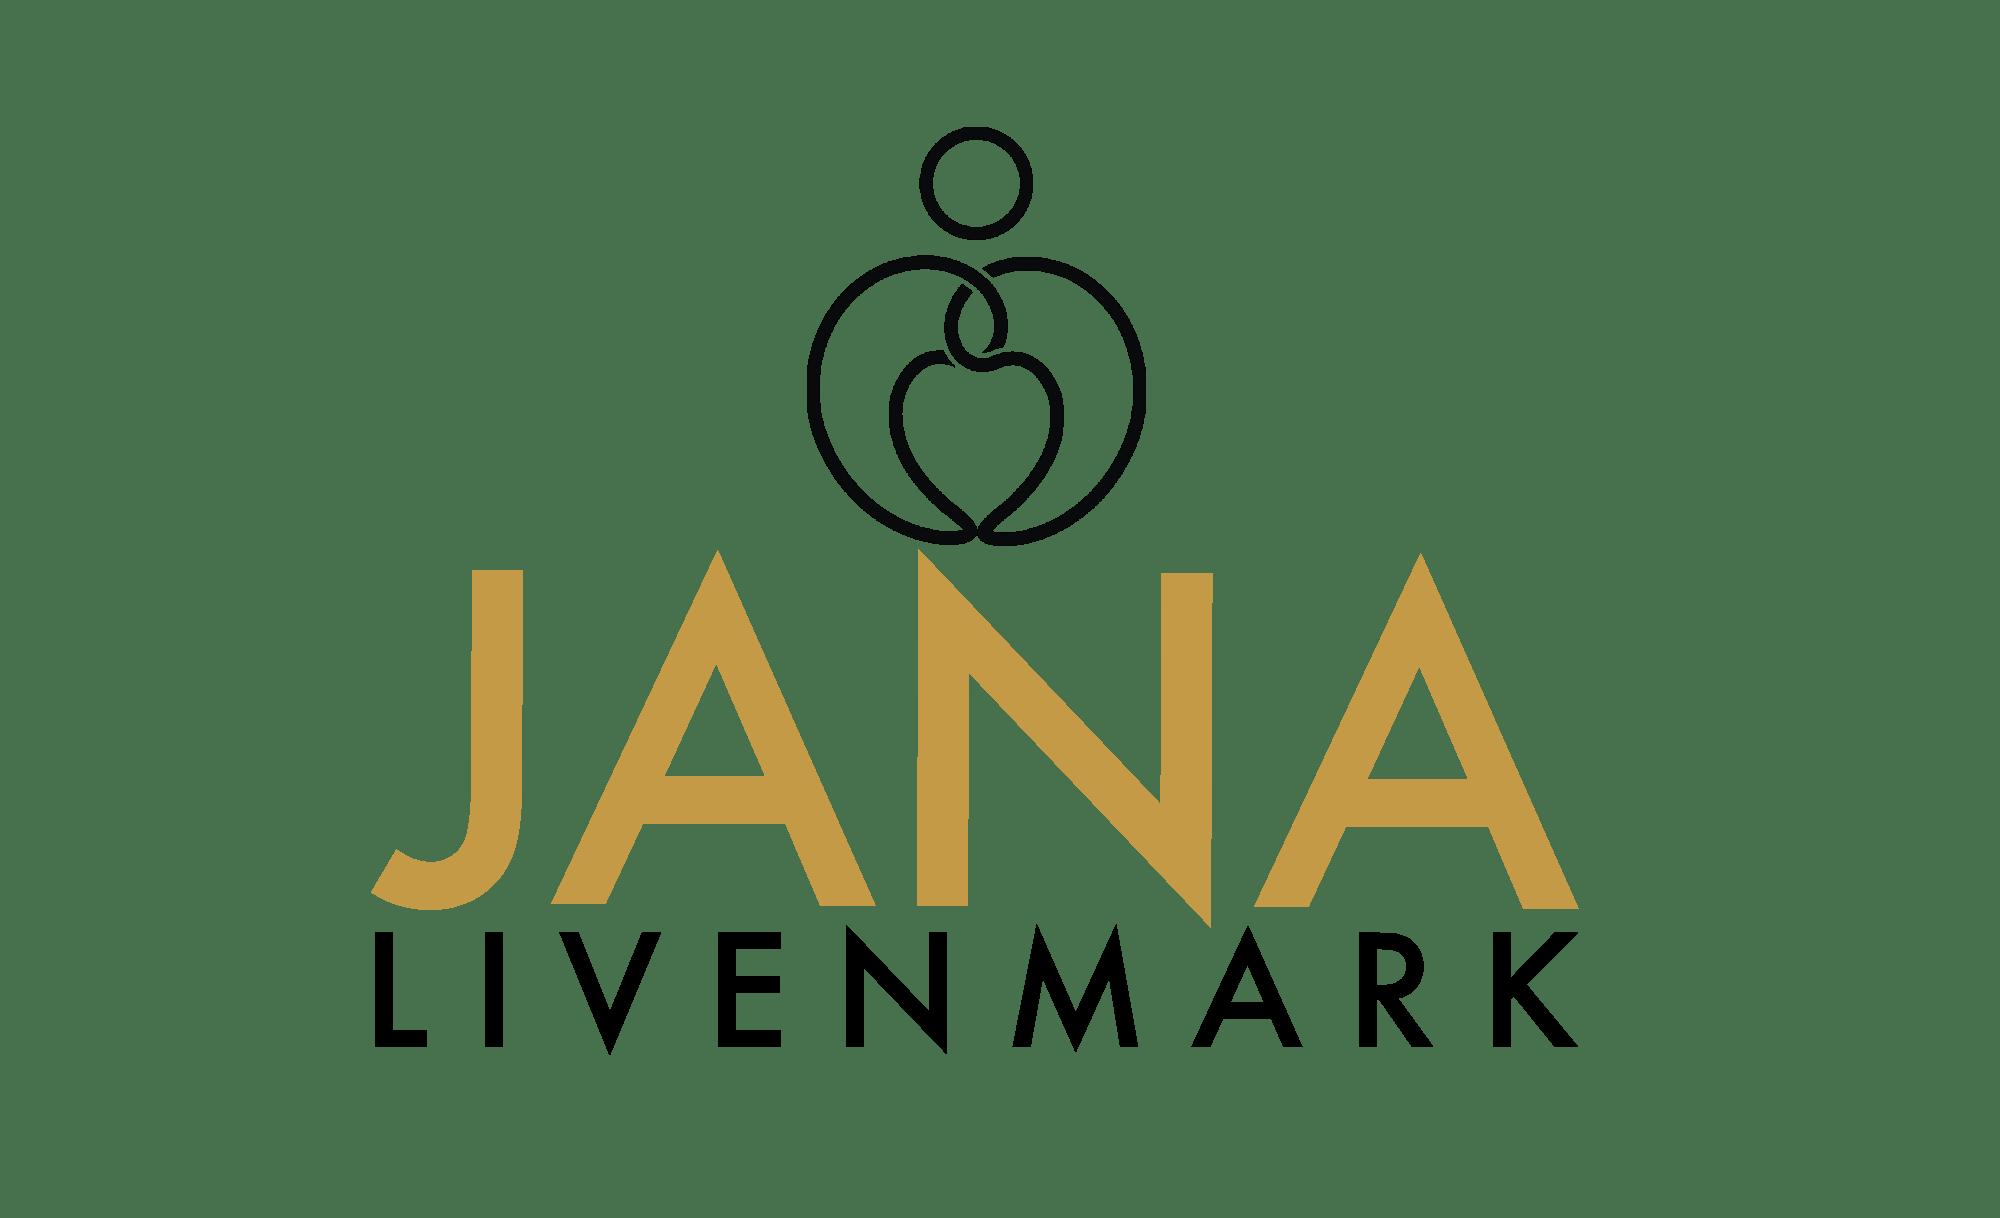 Jana Livenmark